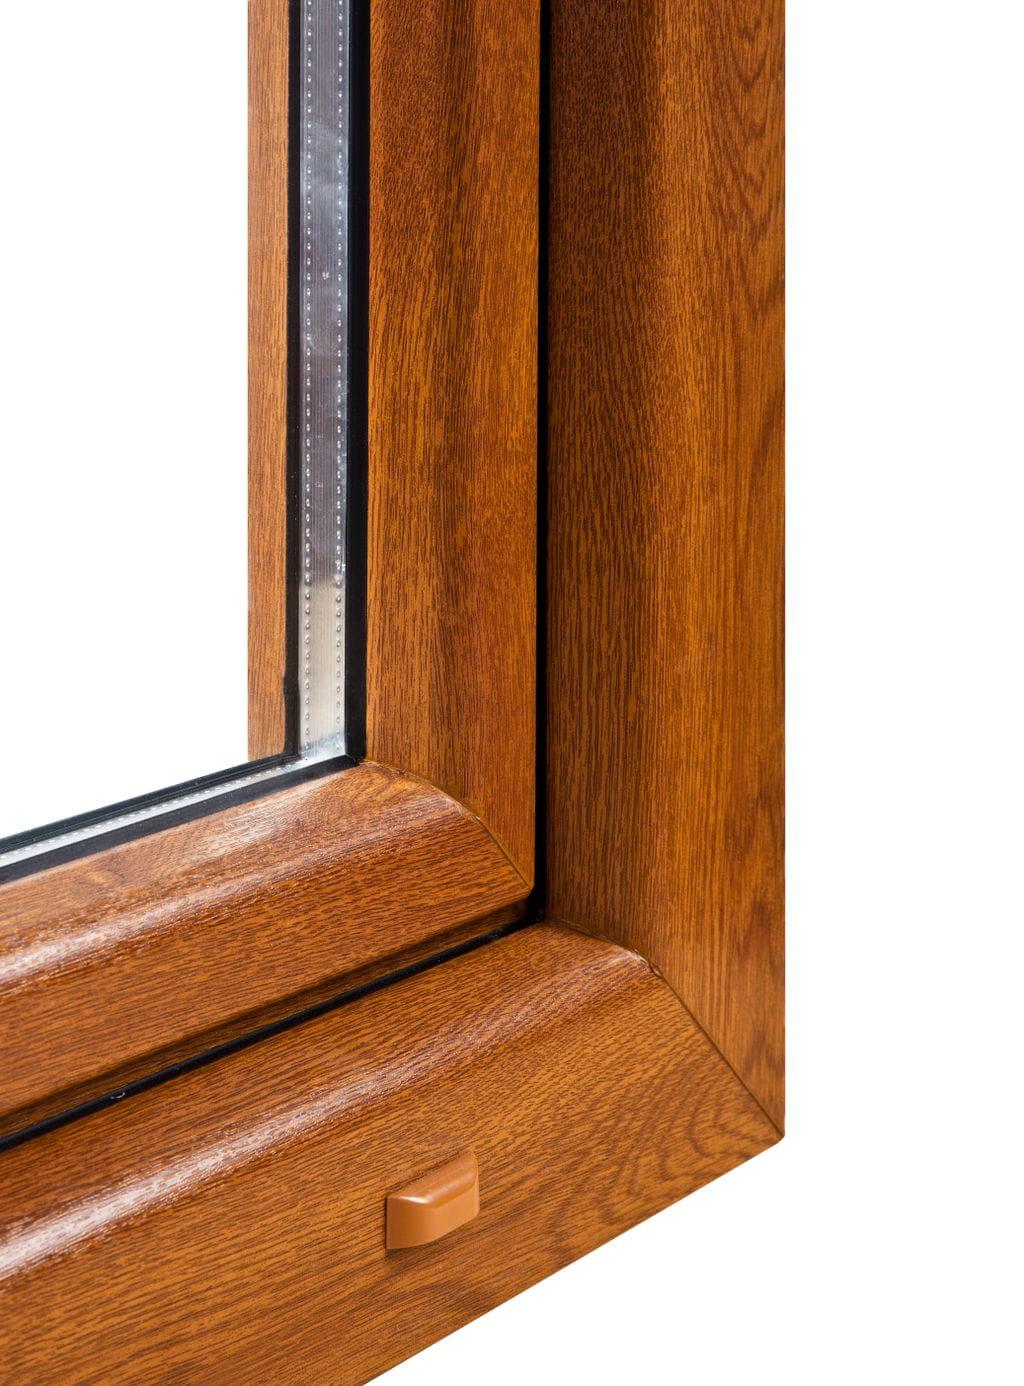 Ventanas pvc imitacion madera cheap ventanas termopanel - Pvc imitacion madera ...